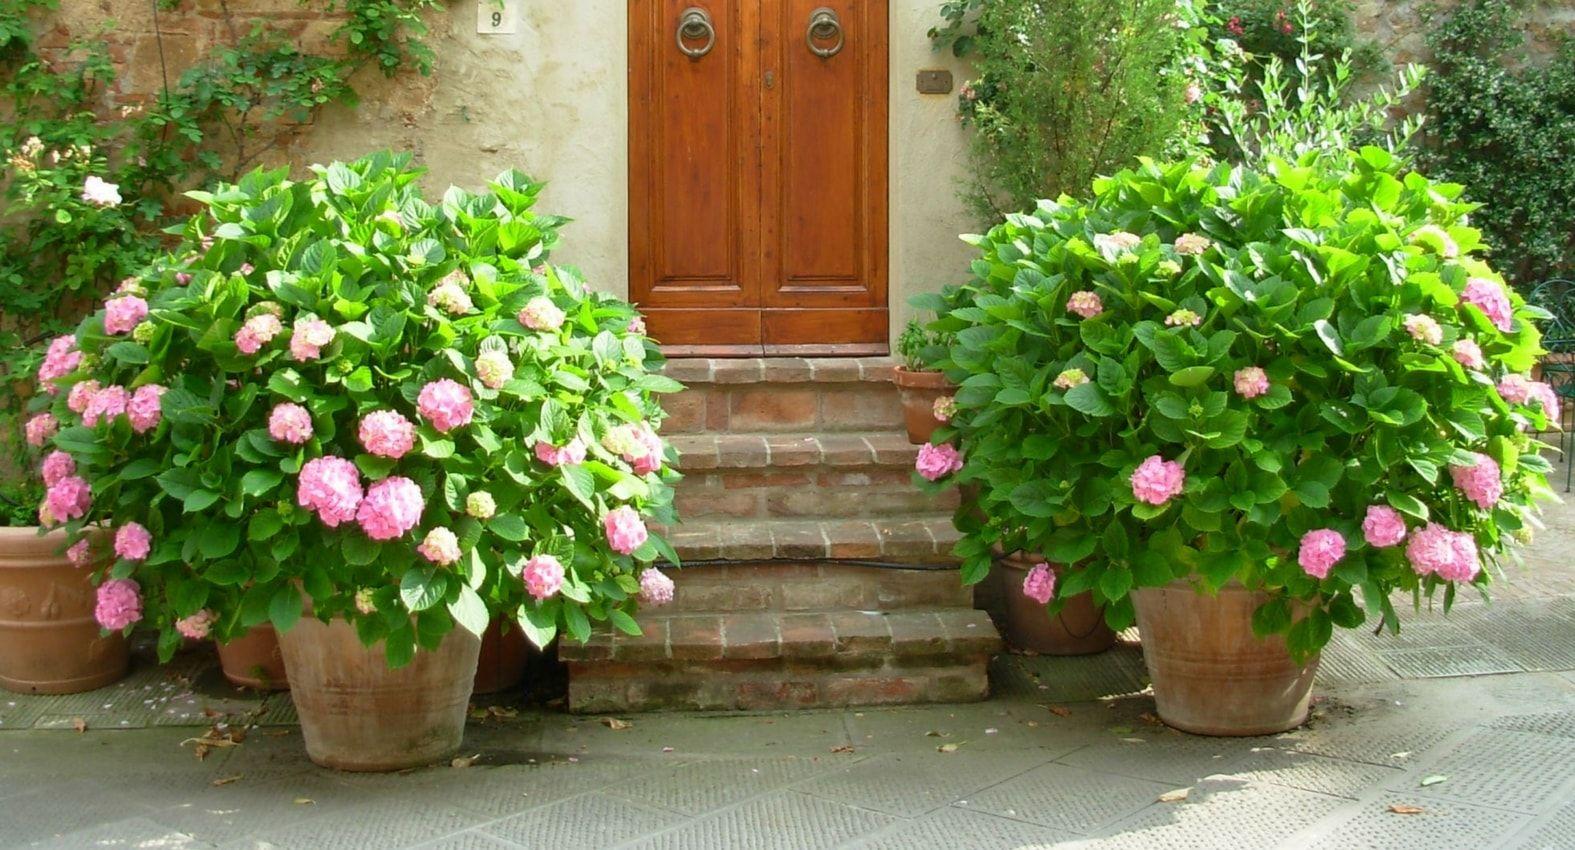 Plantation de l'hortensia (hydrangea) en pot ou bac